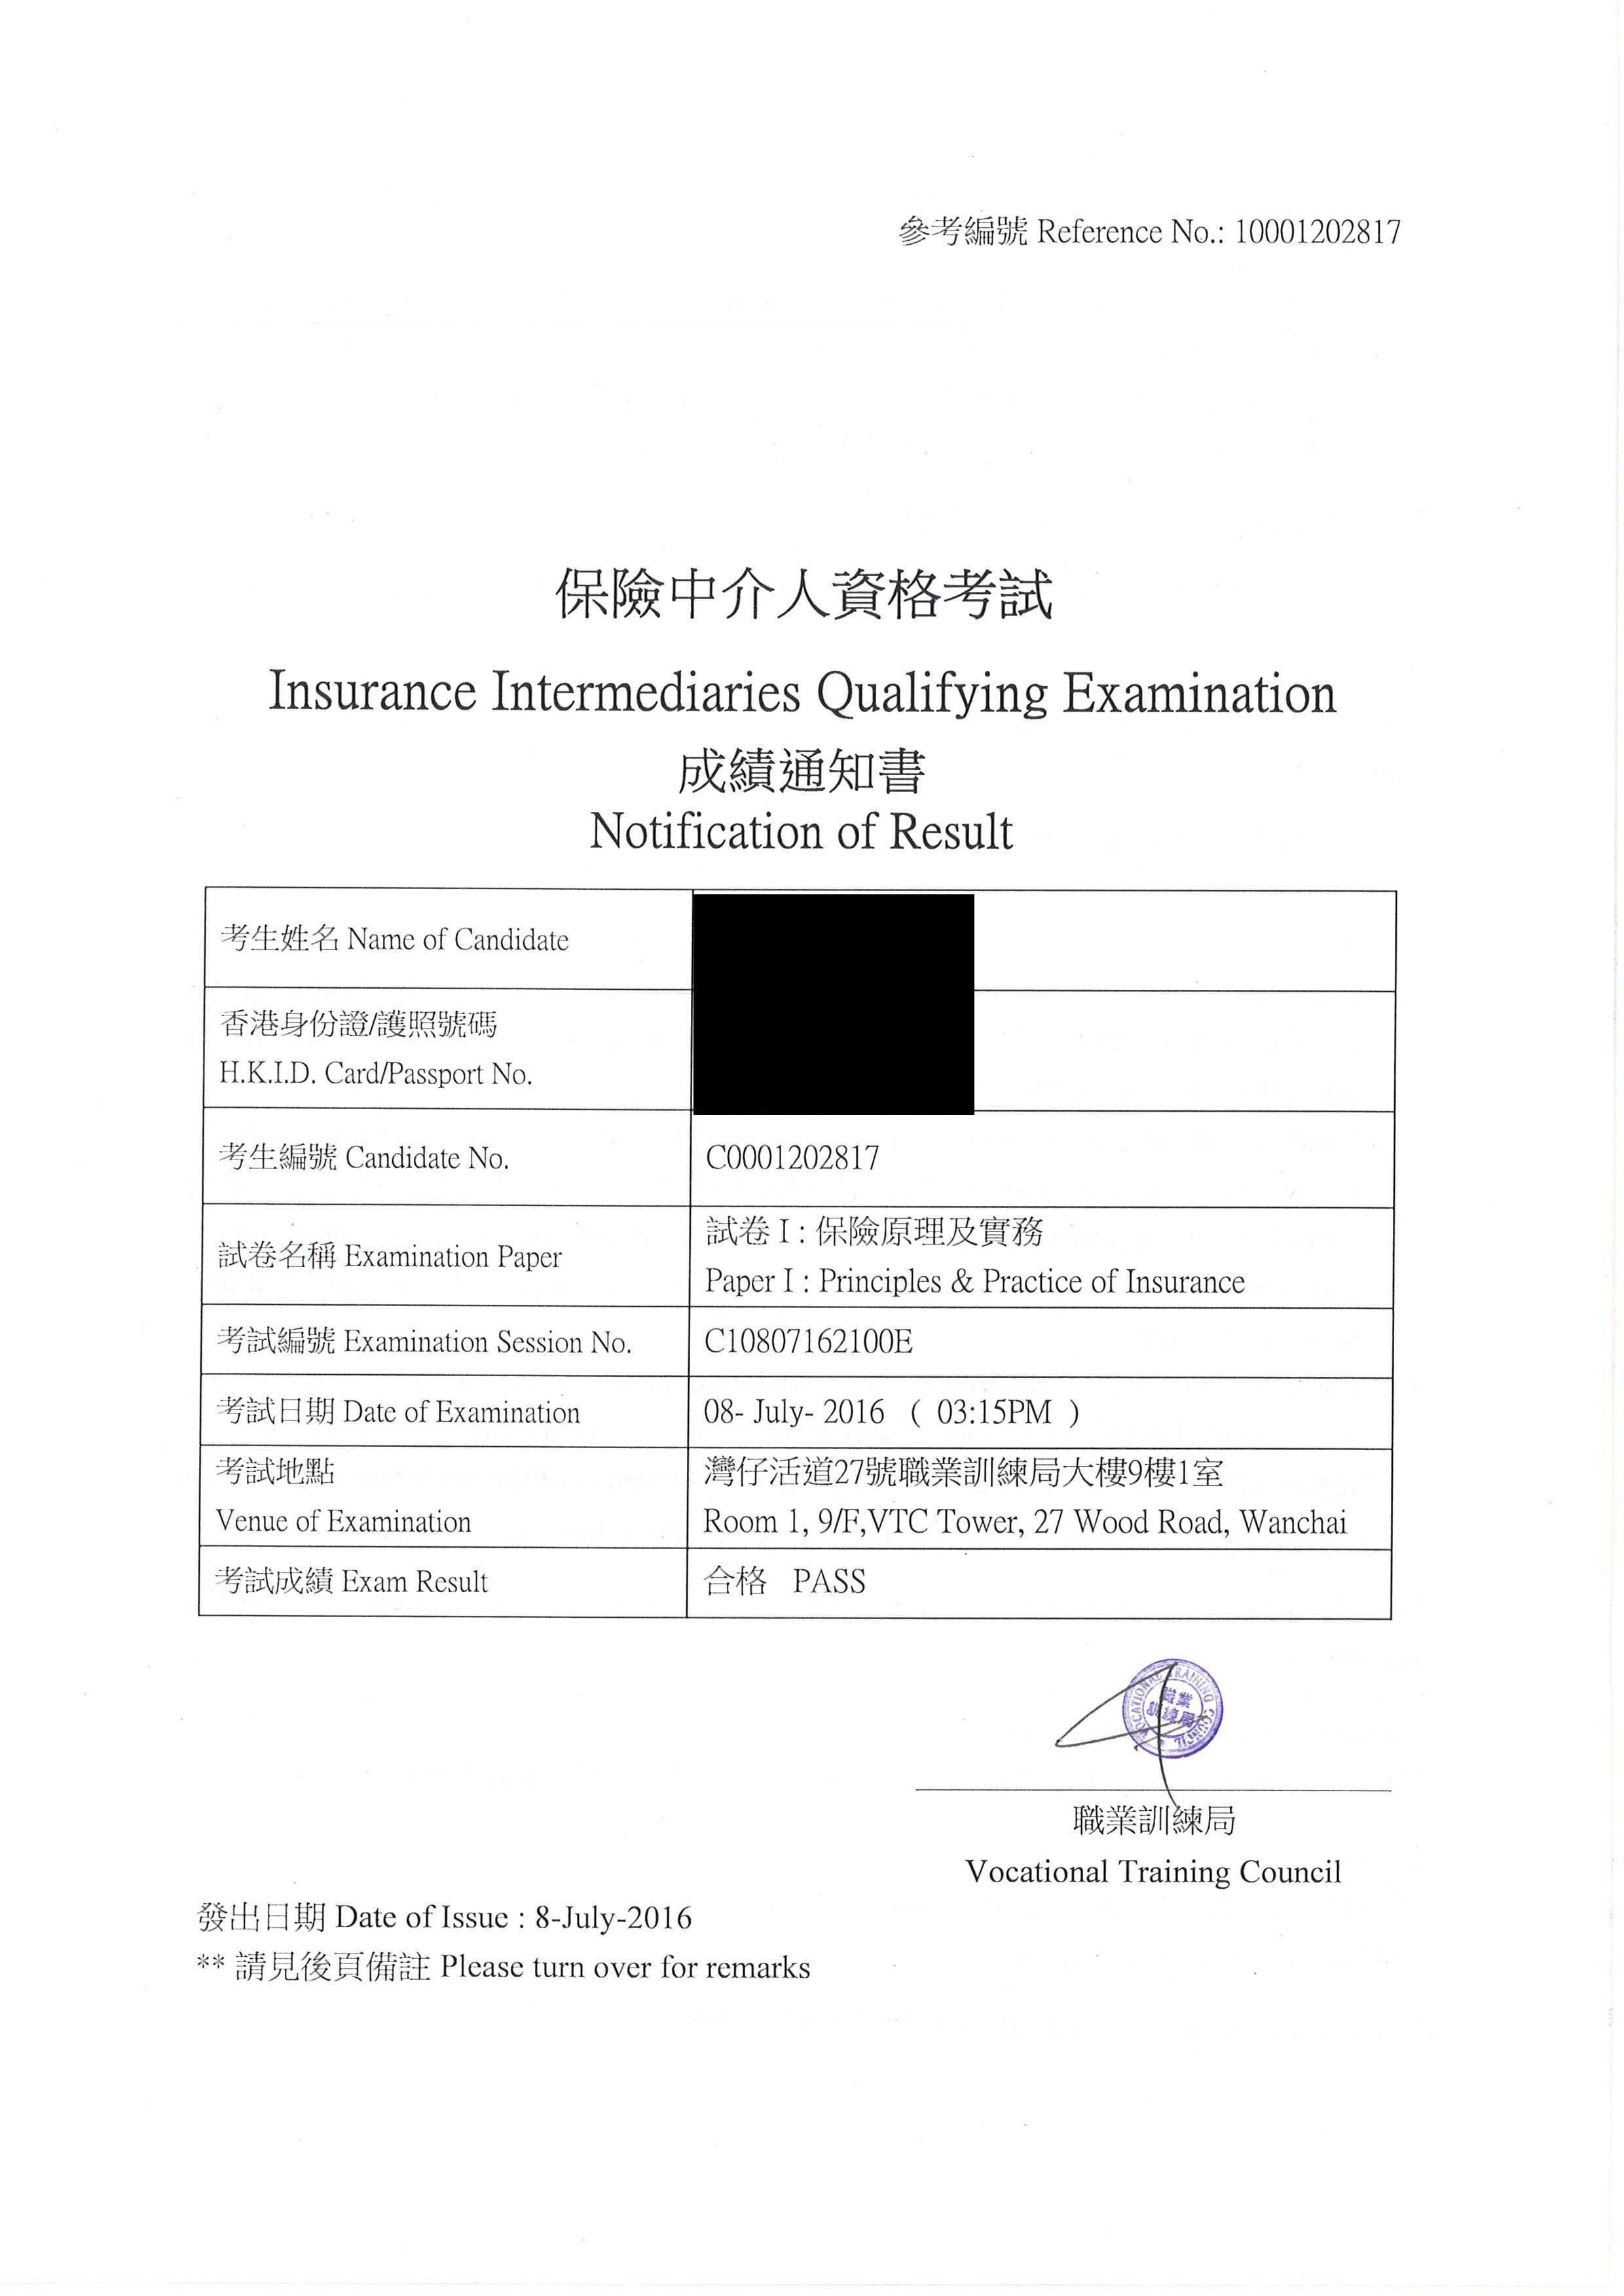 LCW 8/7/2016 IIQE Paper 1  保險中介人資格考試卷一 Pass